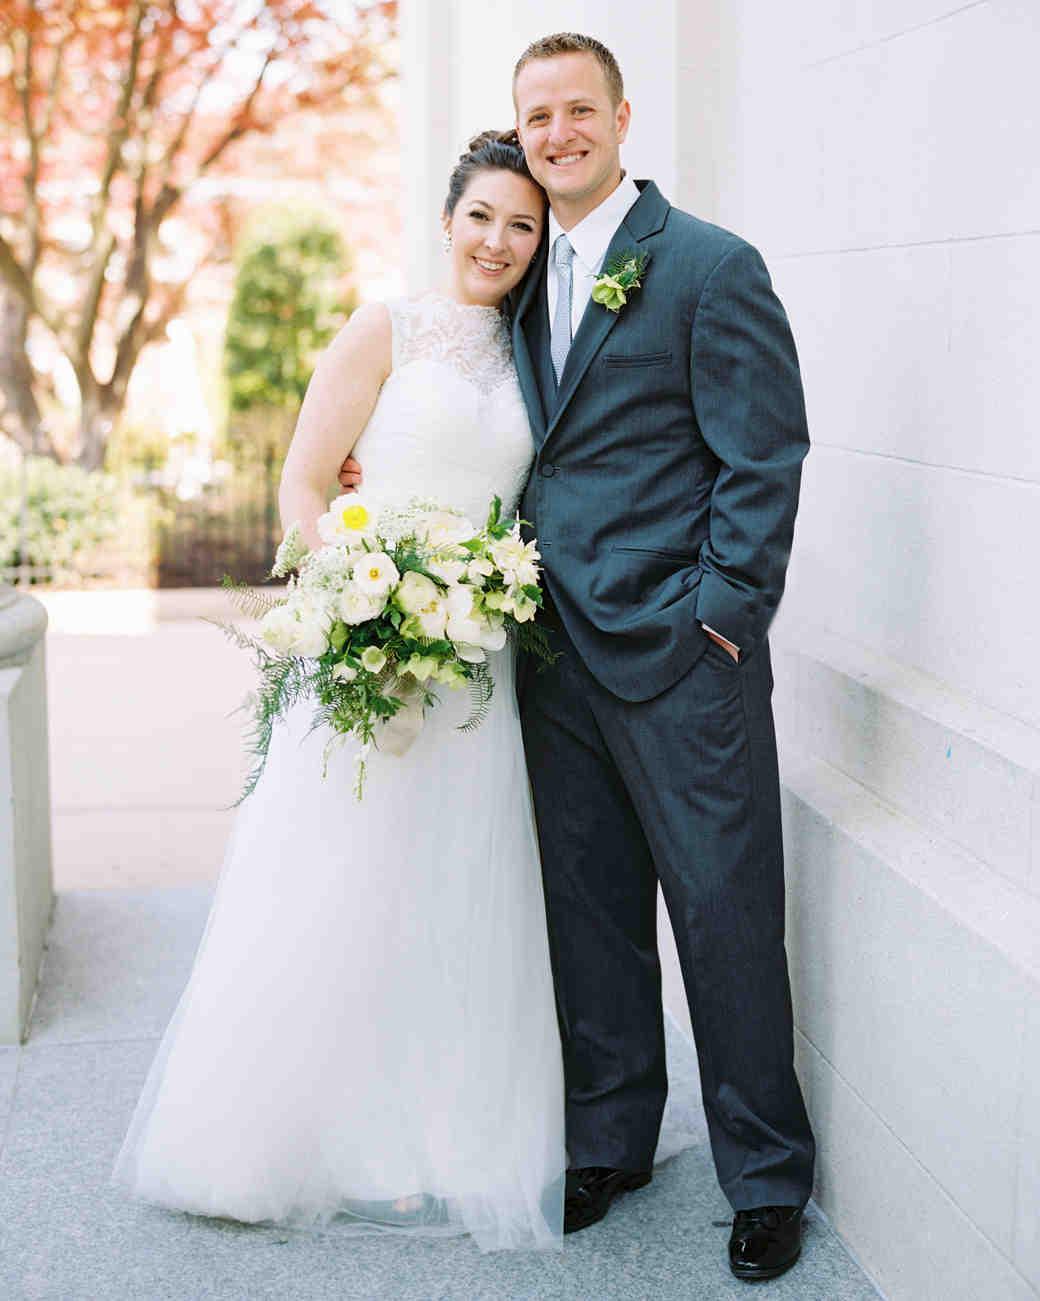 shannon-ryan-wedding-couple-164-s111853-0415.jpg